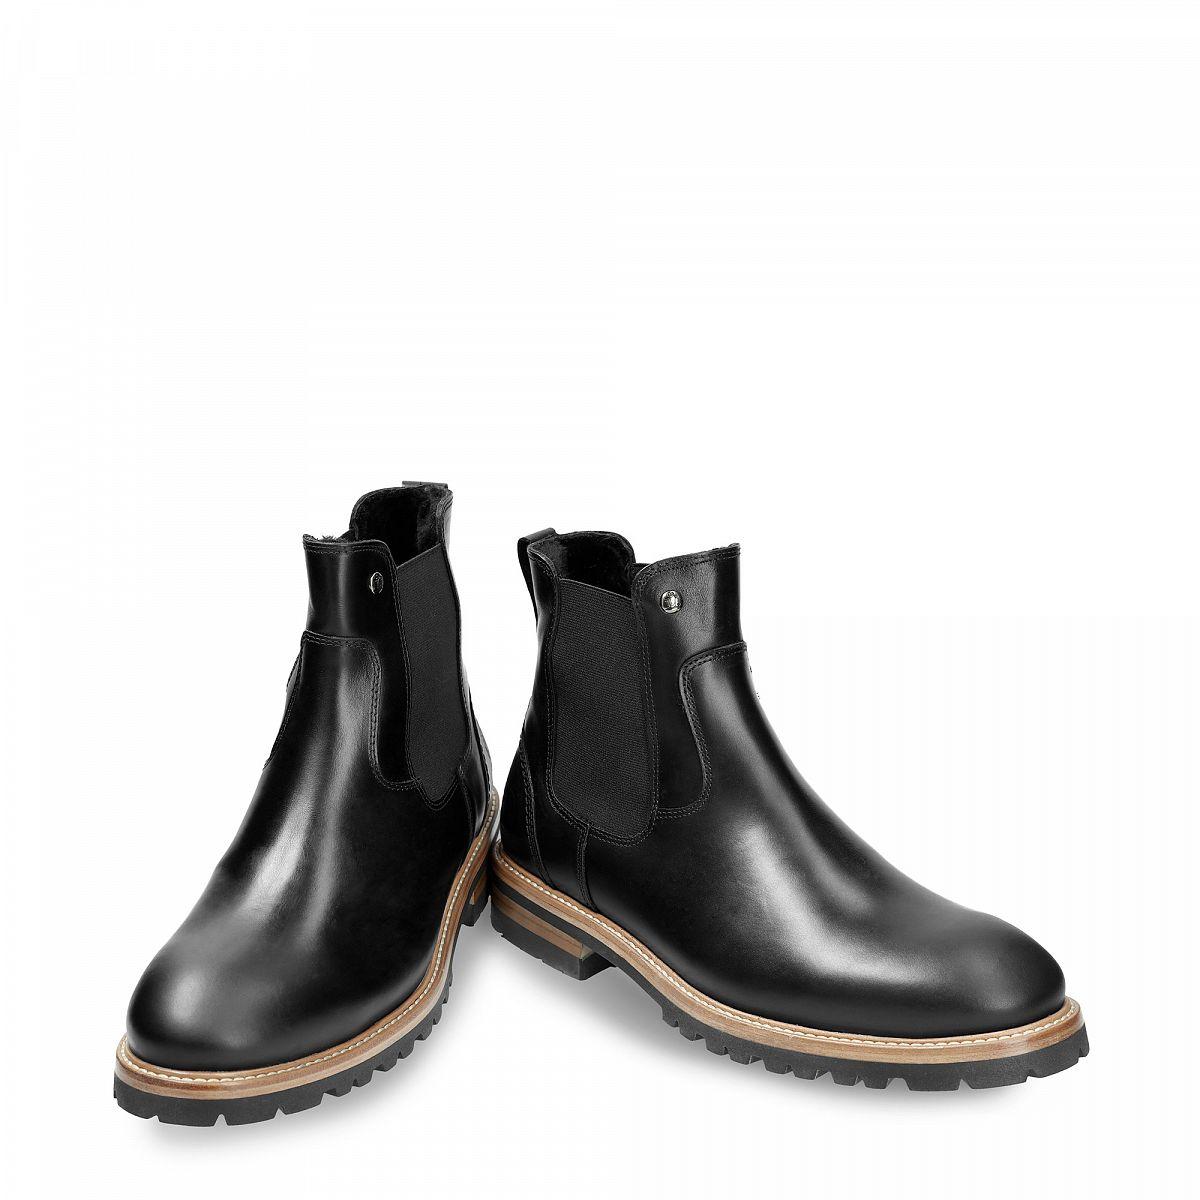 0dc280a8739061 Panama Jack Chelsea Boots – Bildergalerie für Clubbilder